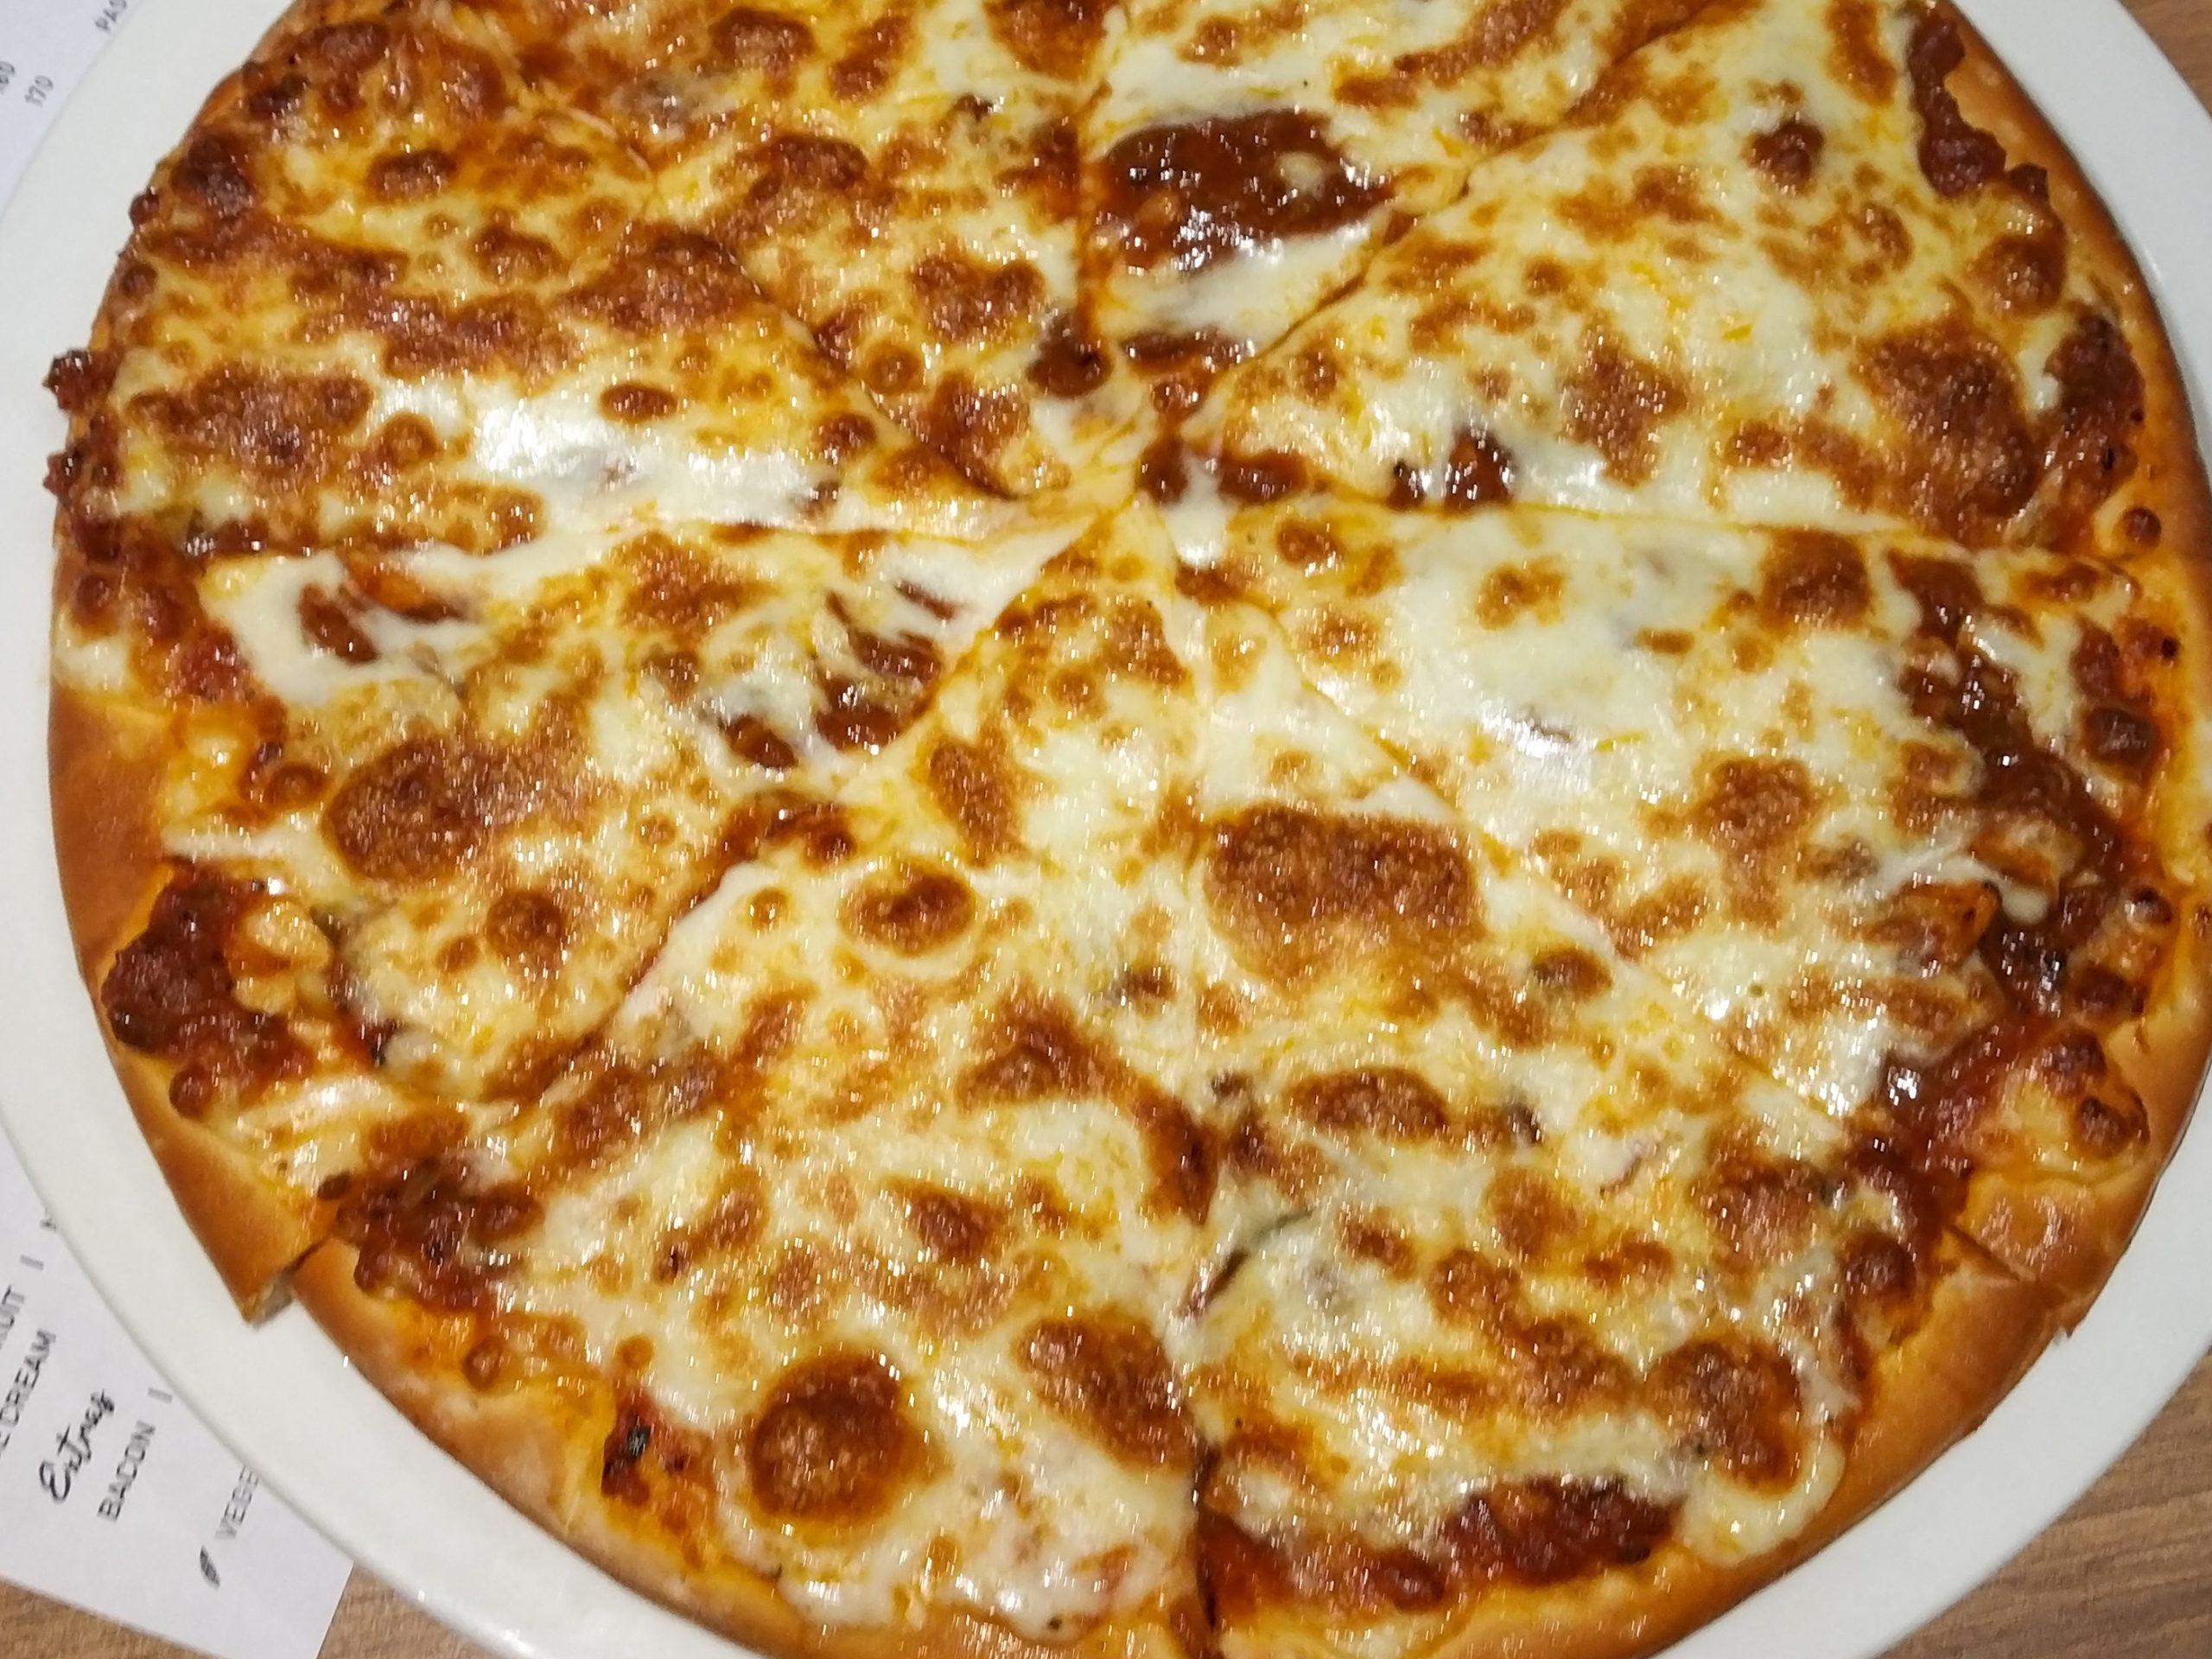 Fresh pizza dish